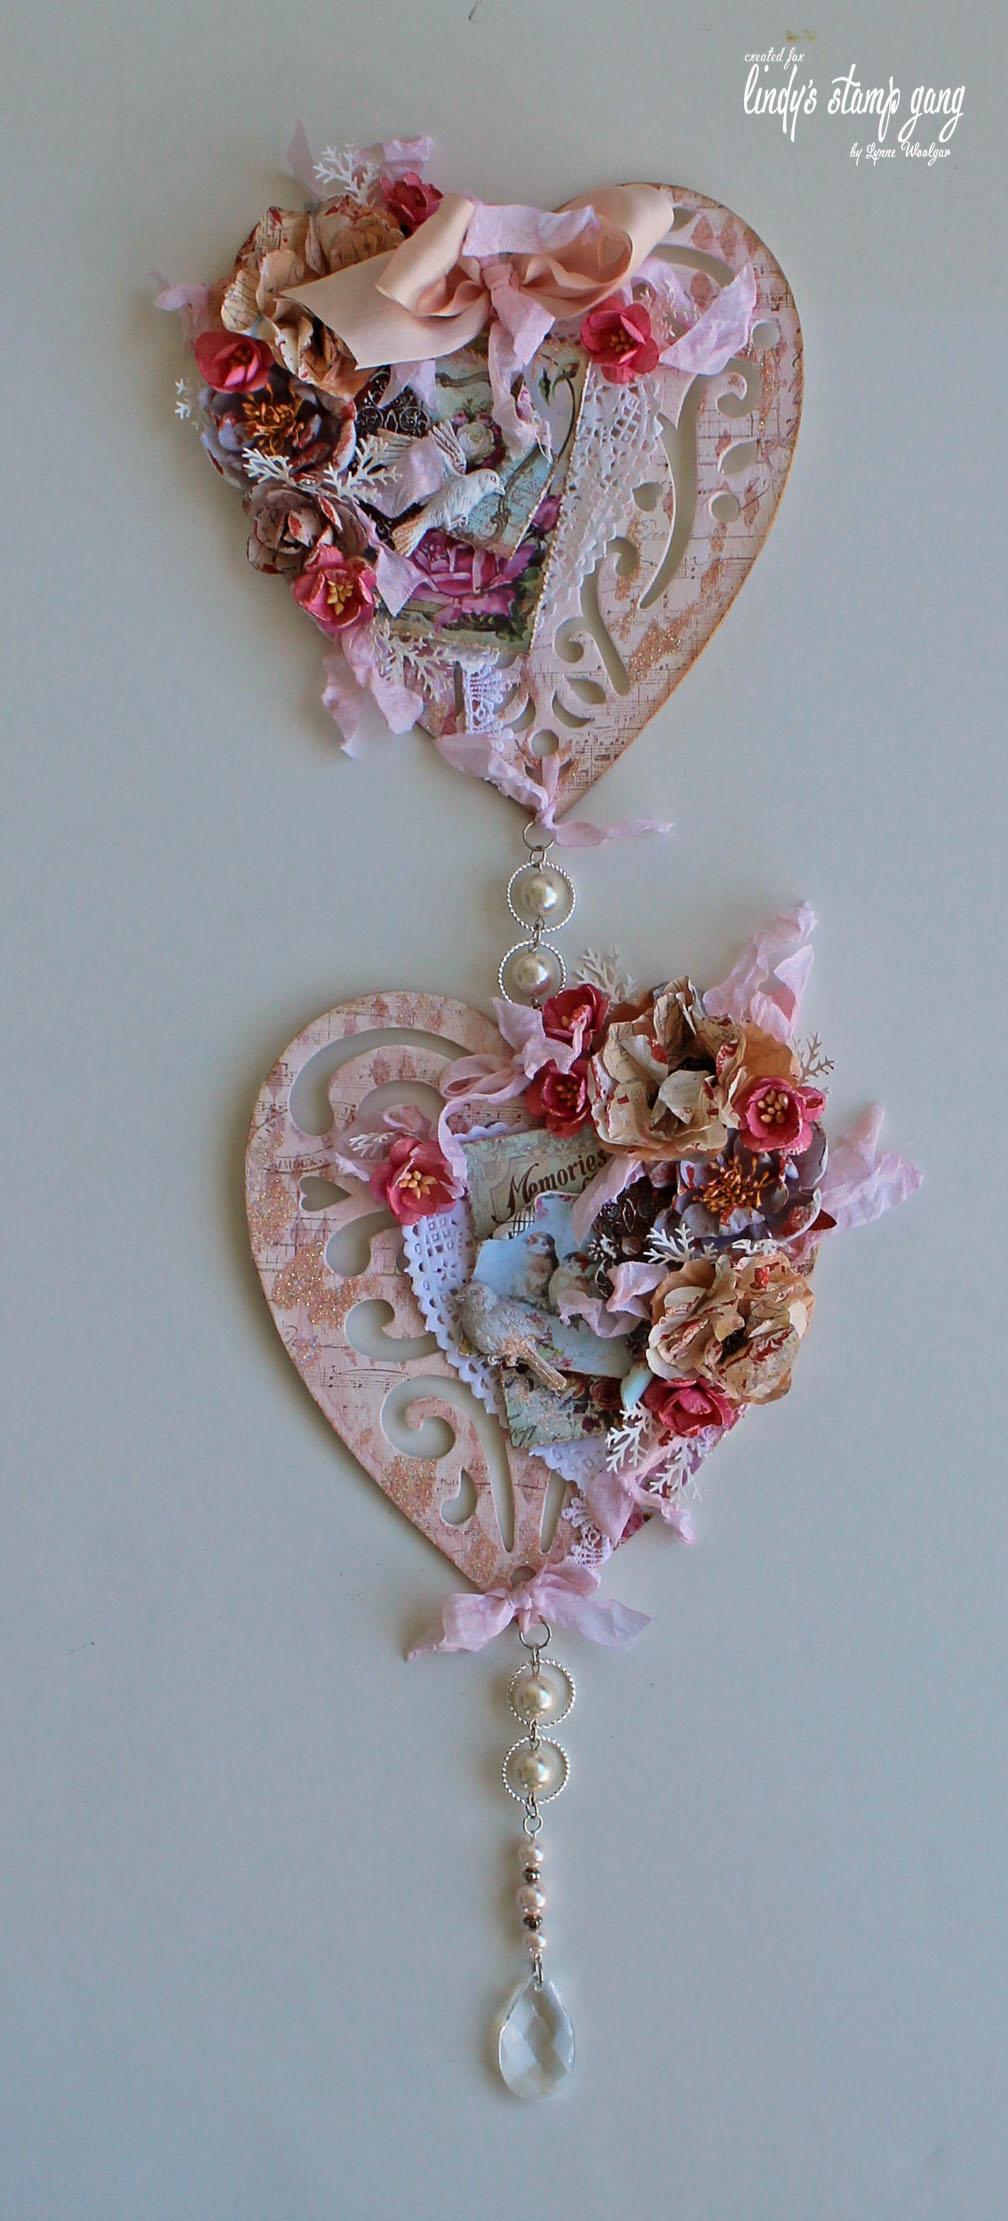 Heart Wall Hanging - Lindy's Gang